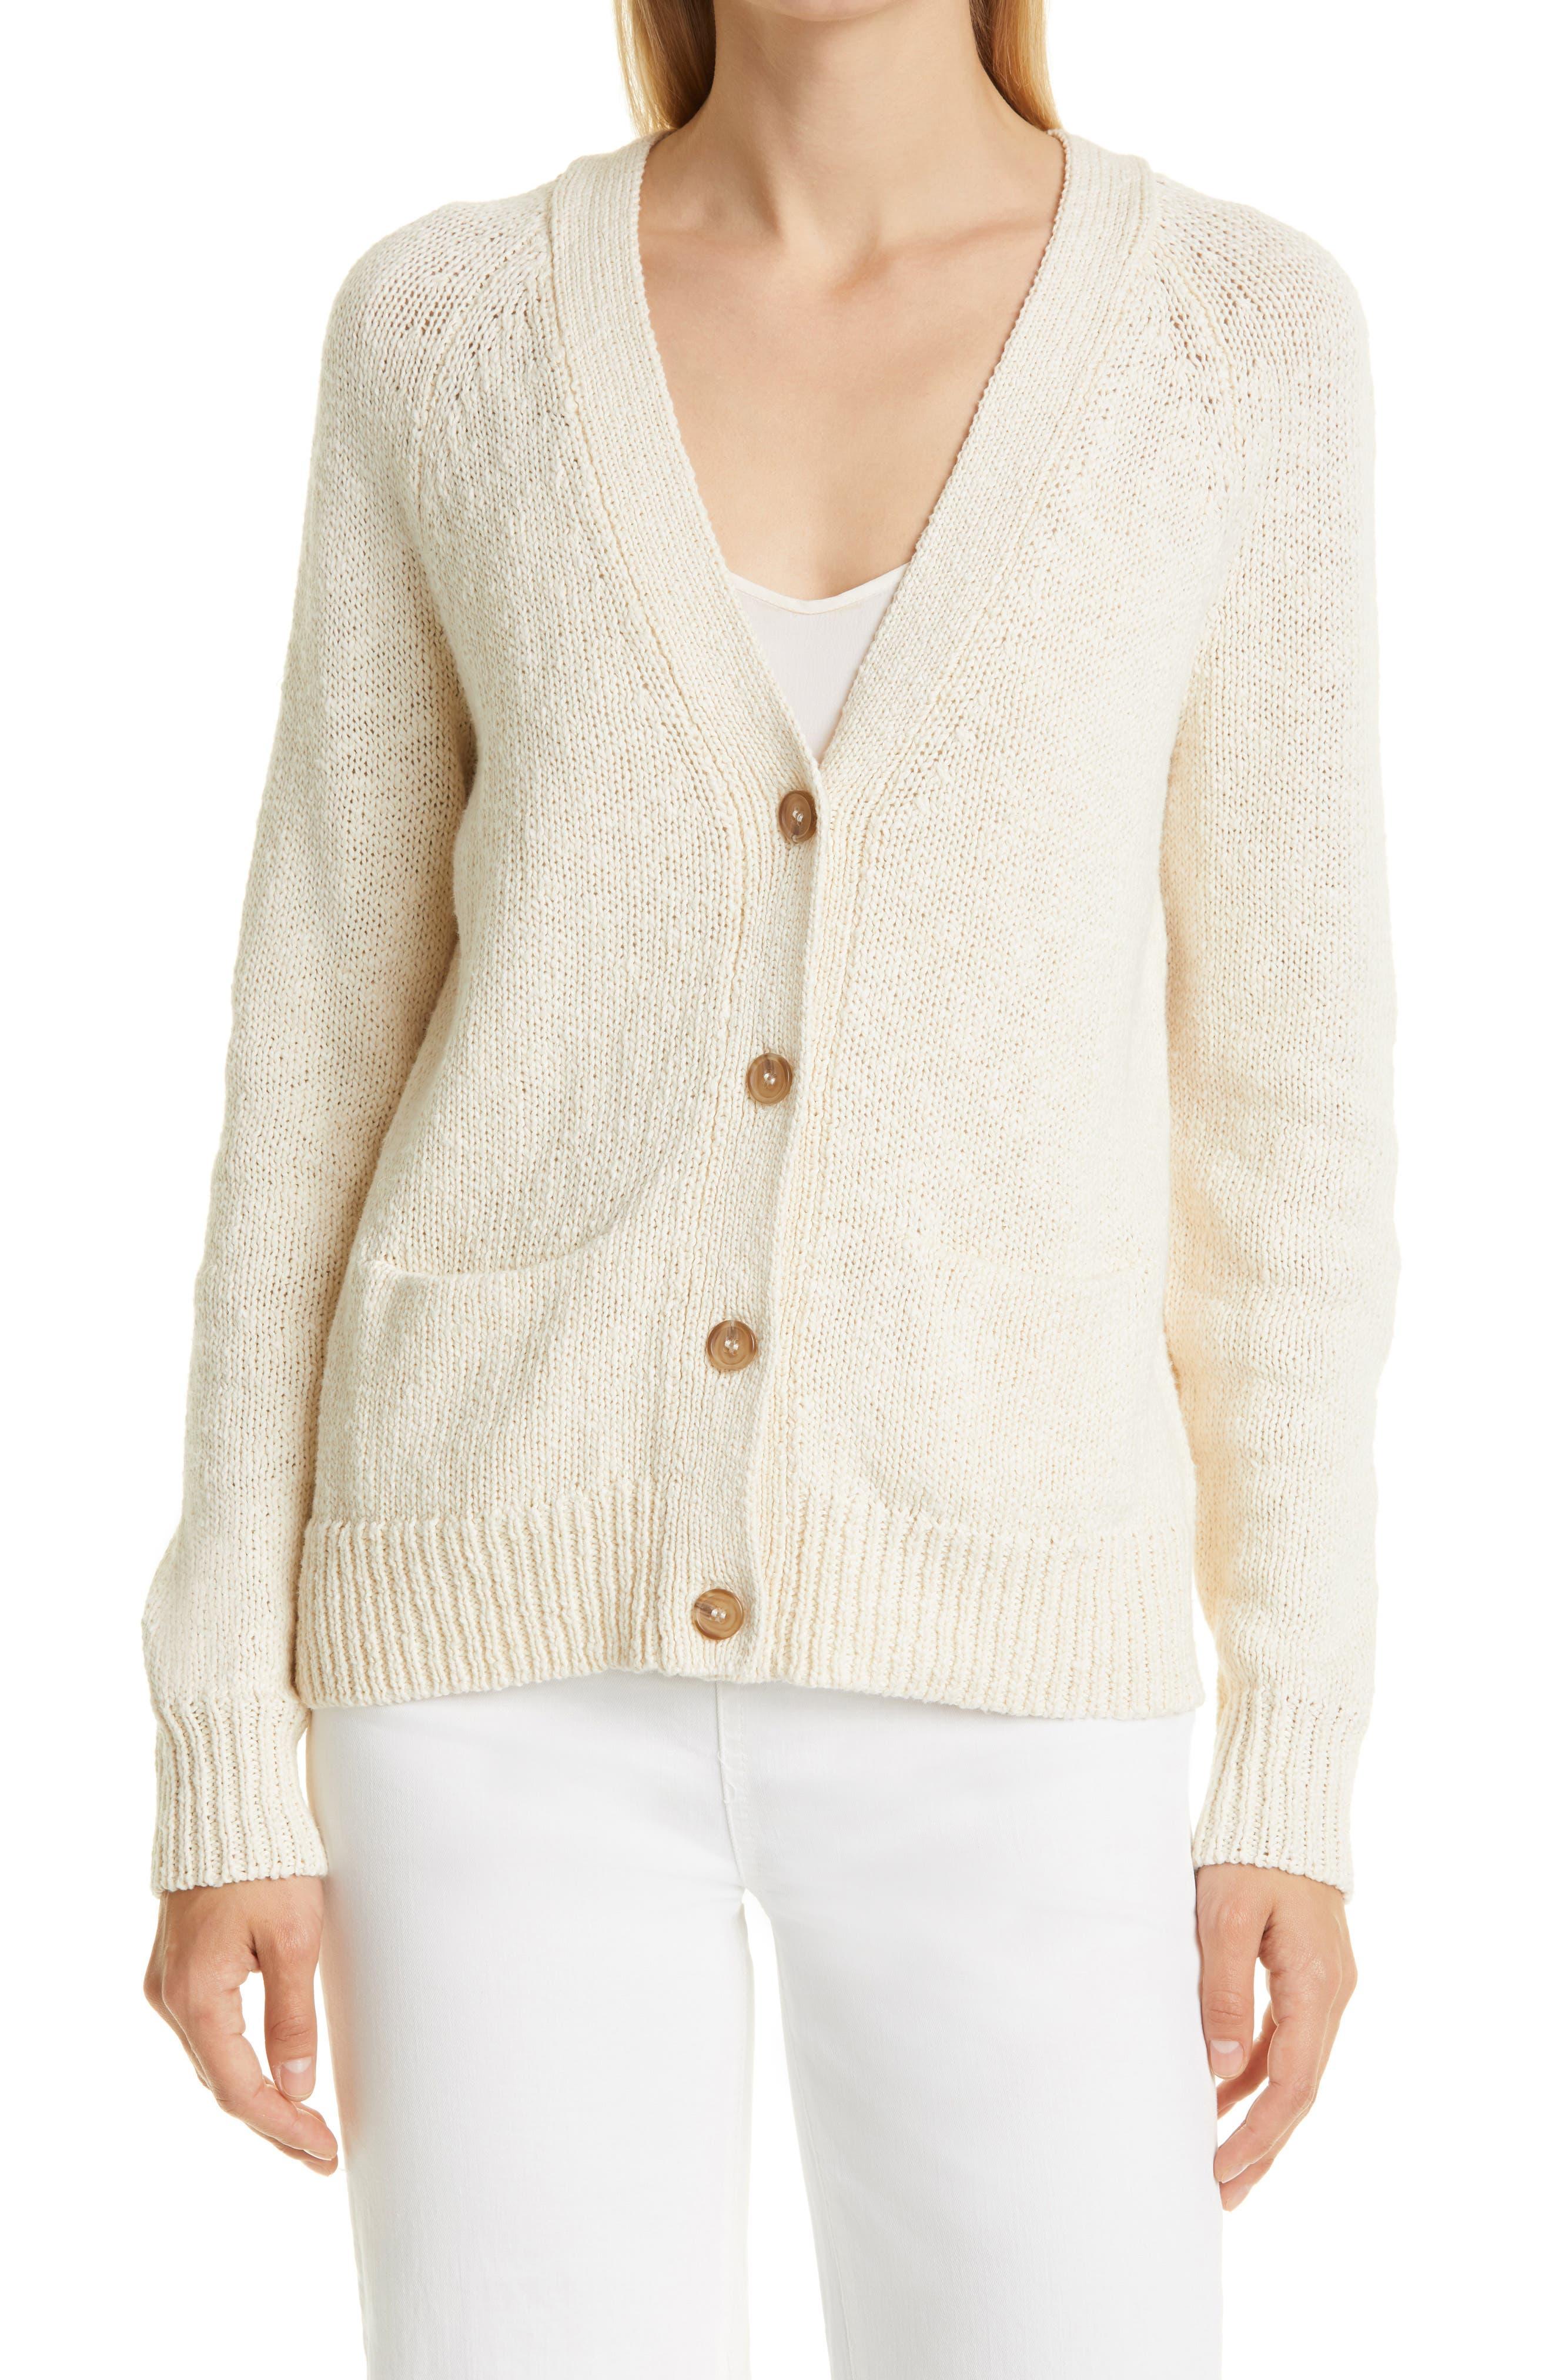 Stanford Cotton & Linen Cardigan